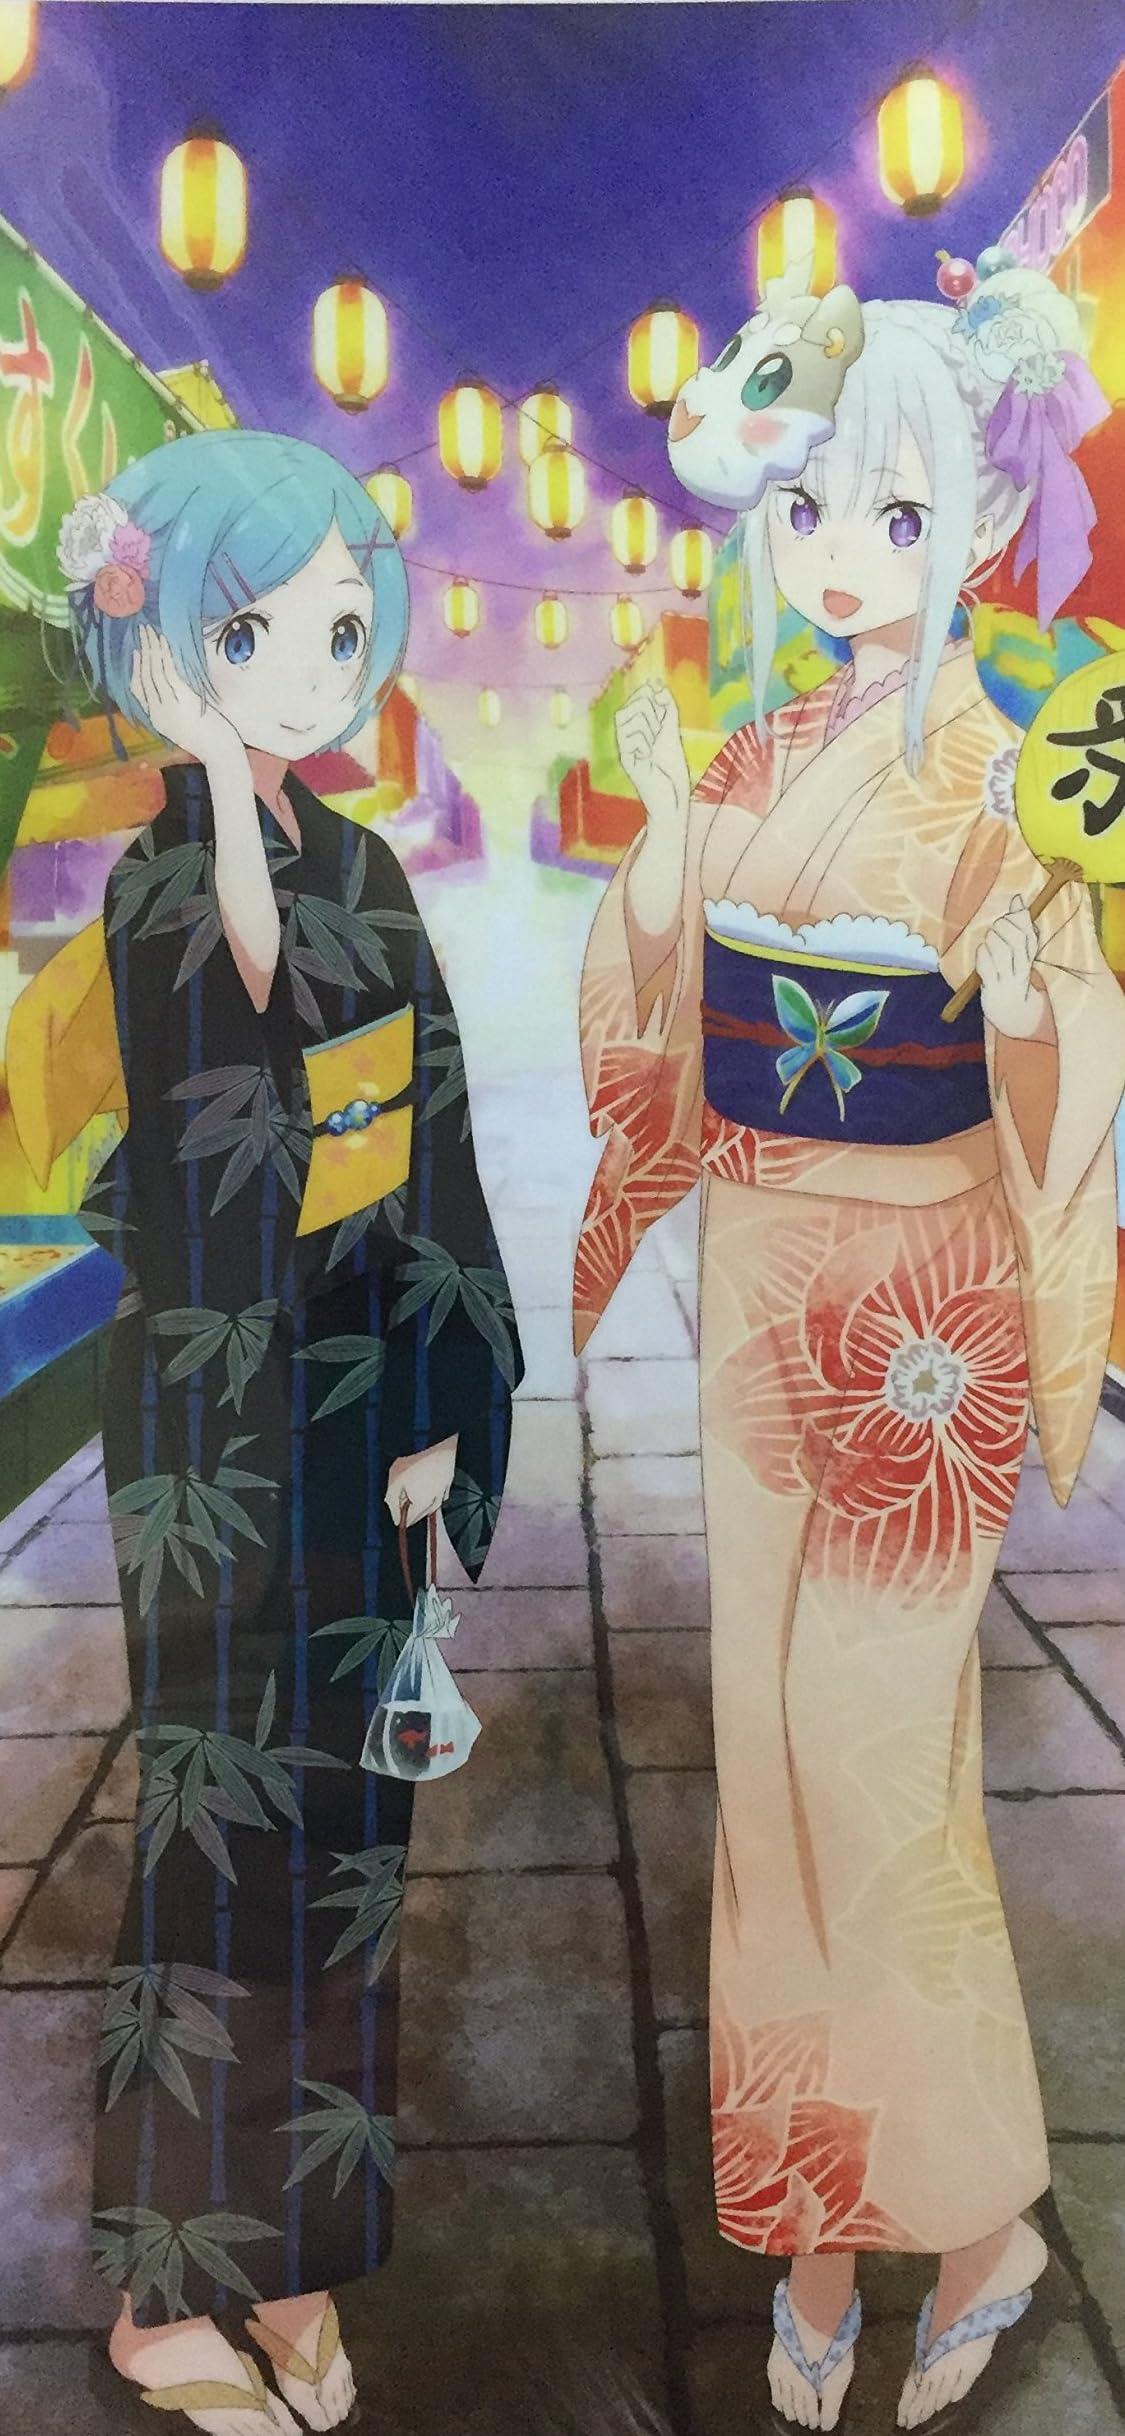 Re:ゼロから始める異世界生活 エミリア & レム 夏祭りver. iPhone X 壁紙(1125x2436)画像